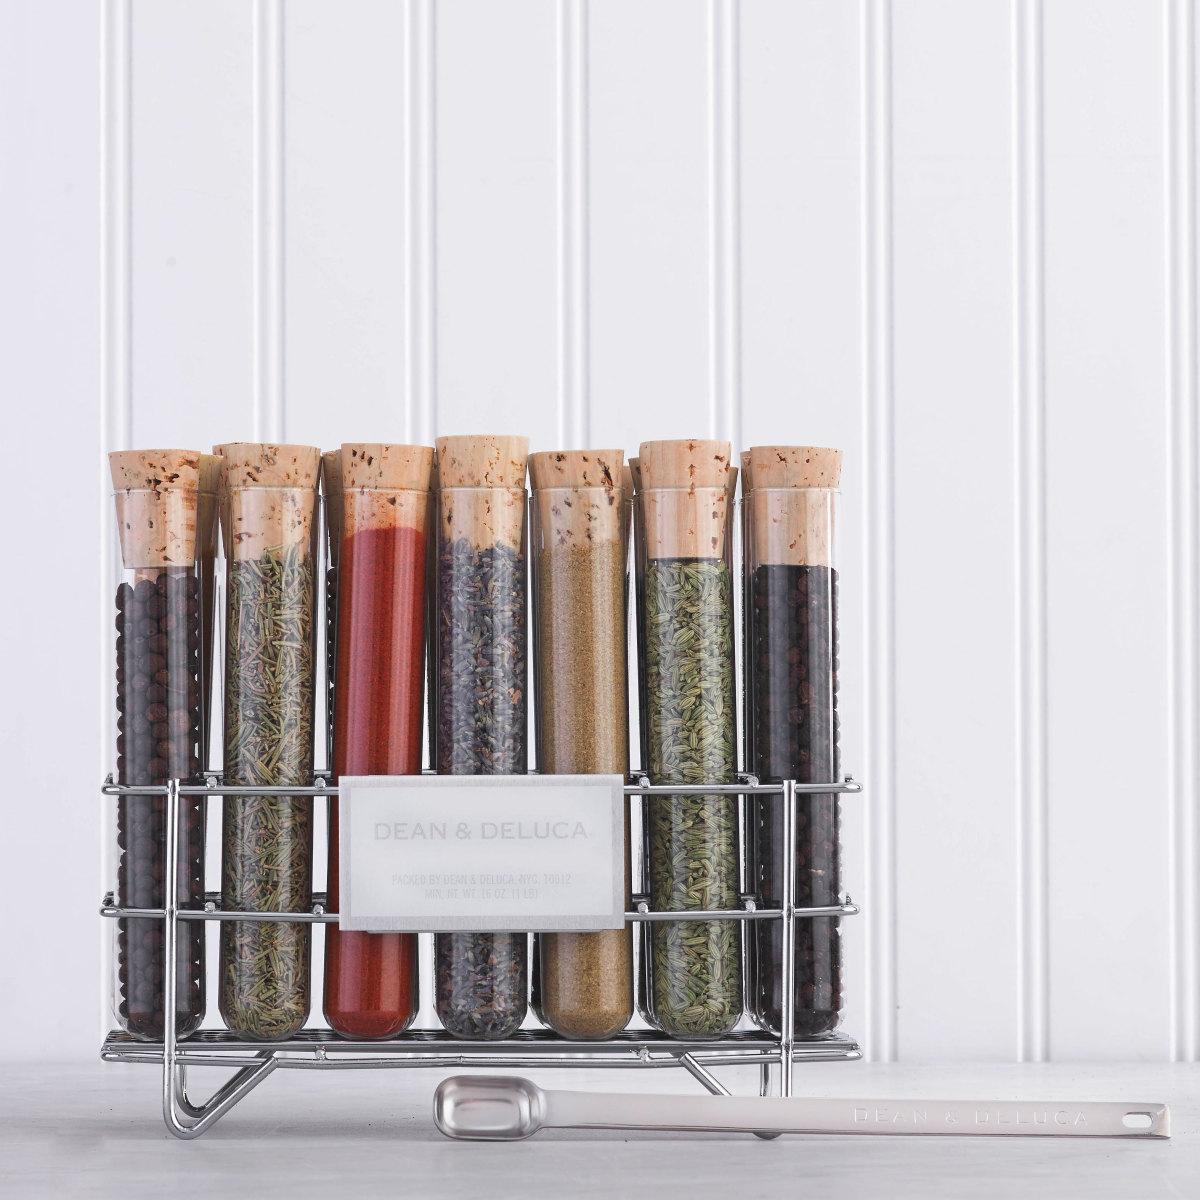 dean-andamp-deluca-spice-rack